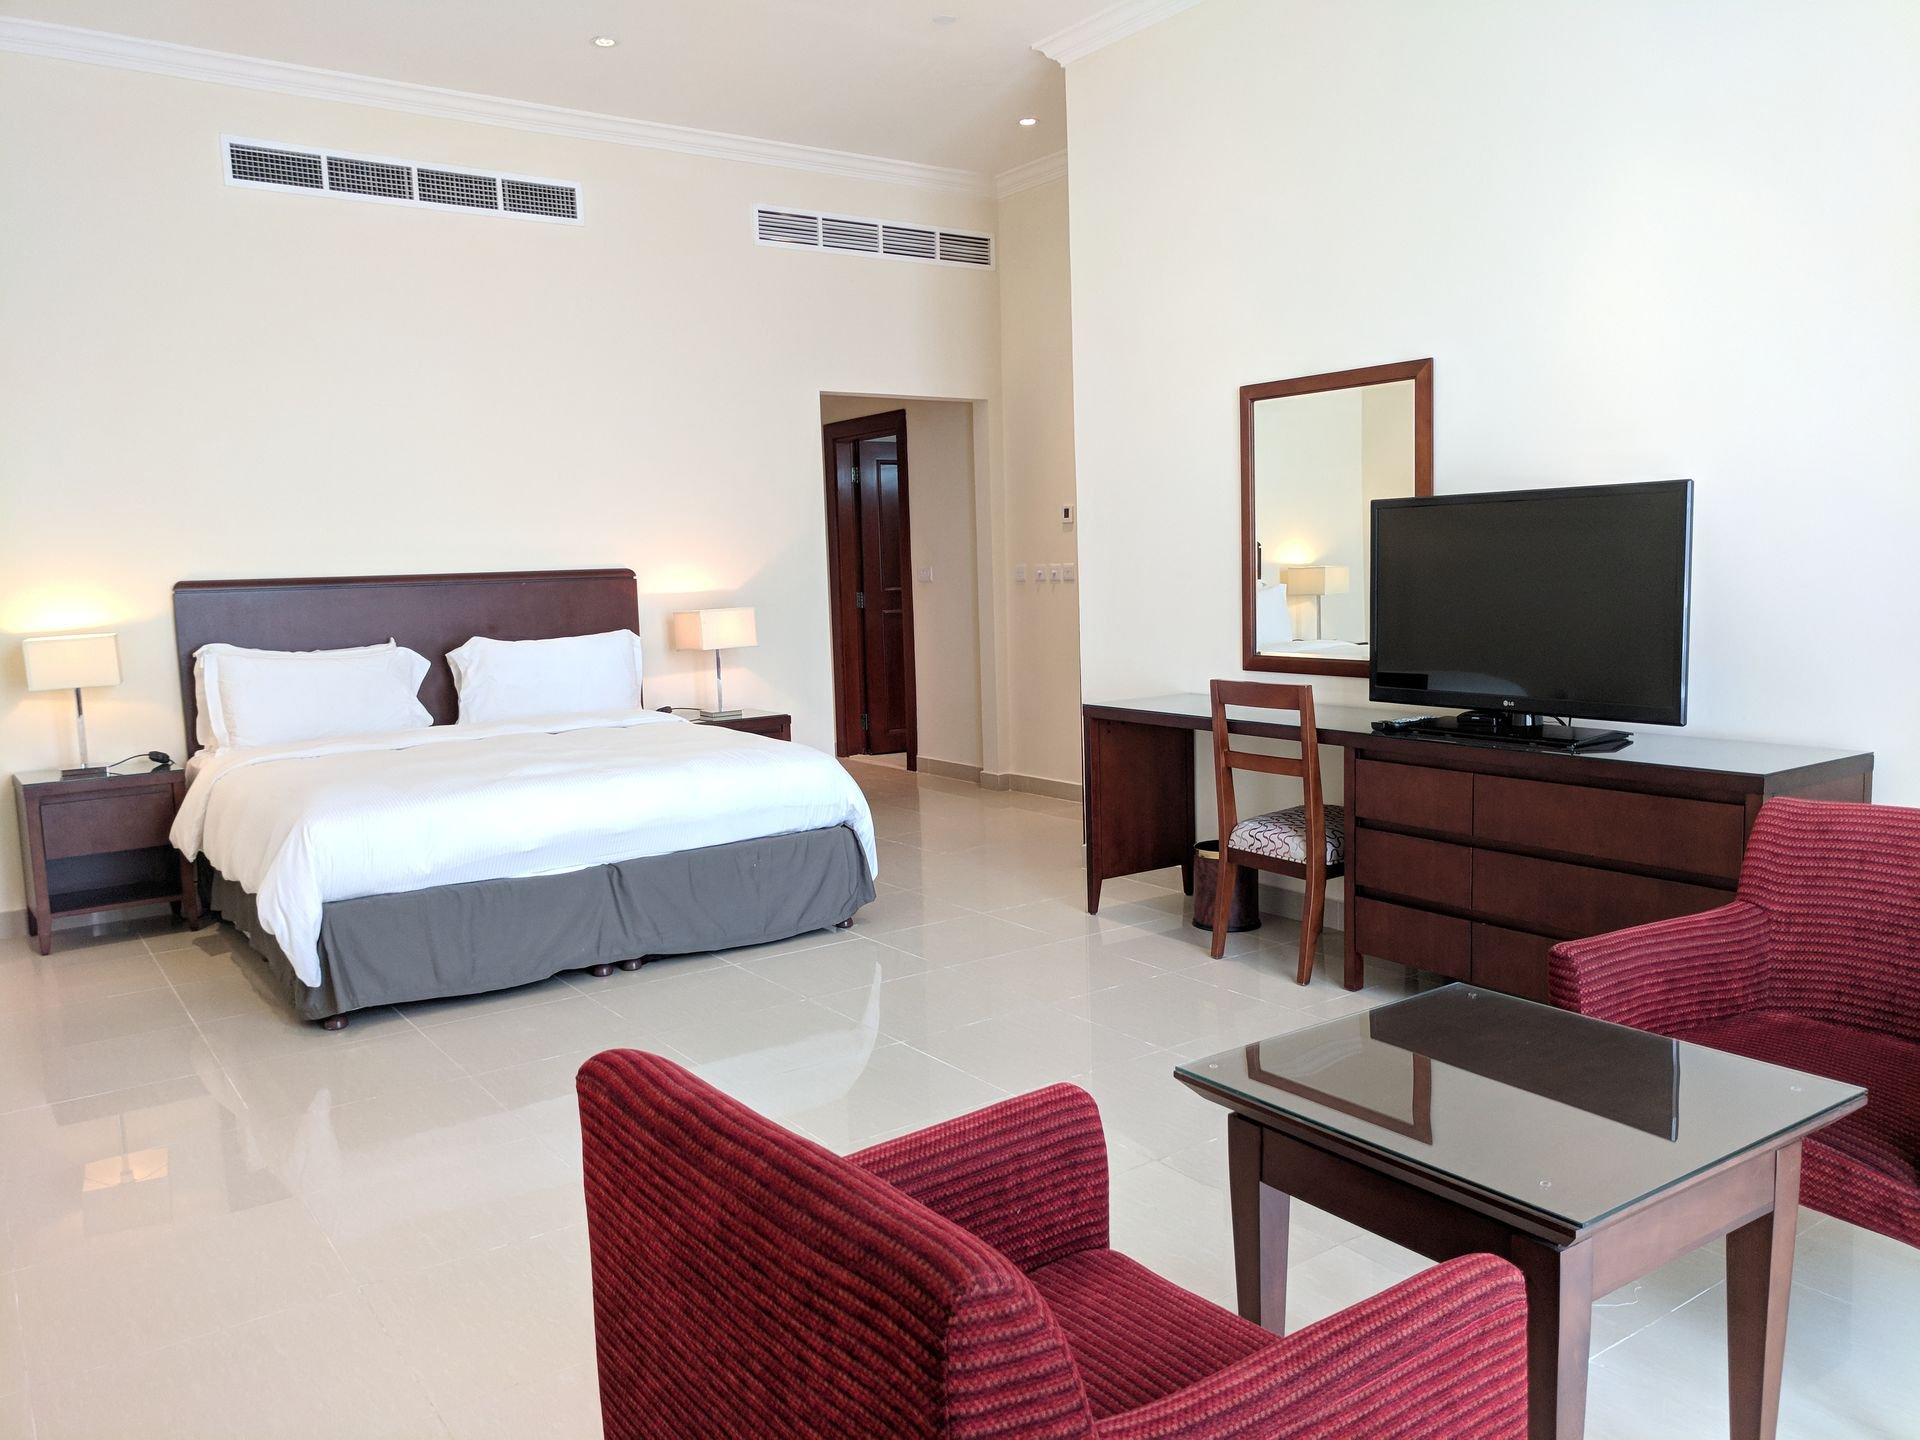 Ad Rental Apartment Doha The Pearl, 3 Rooms ref:L1235DA